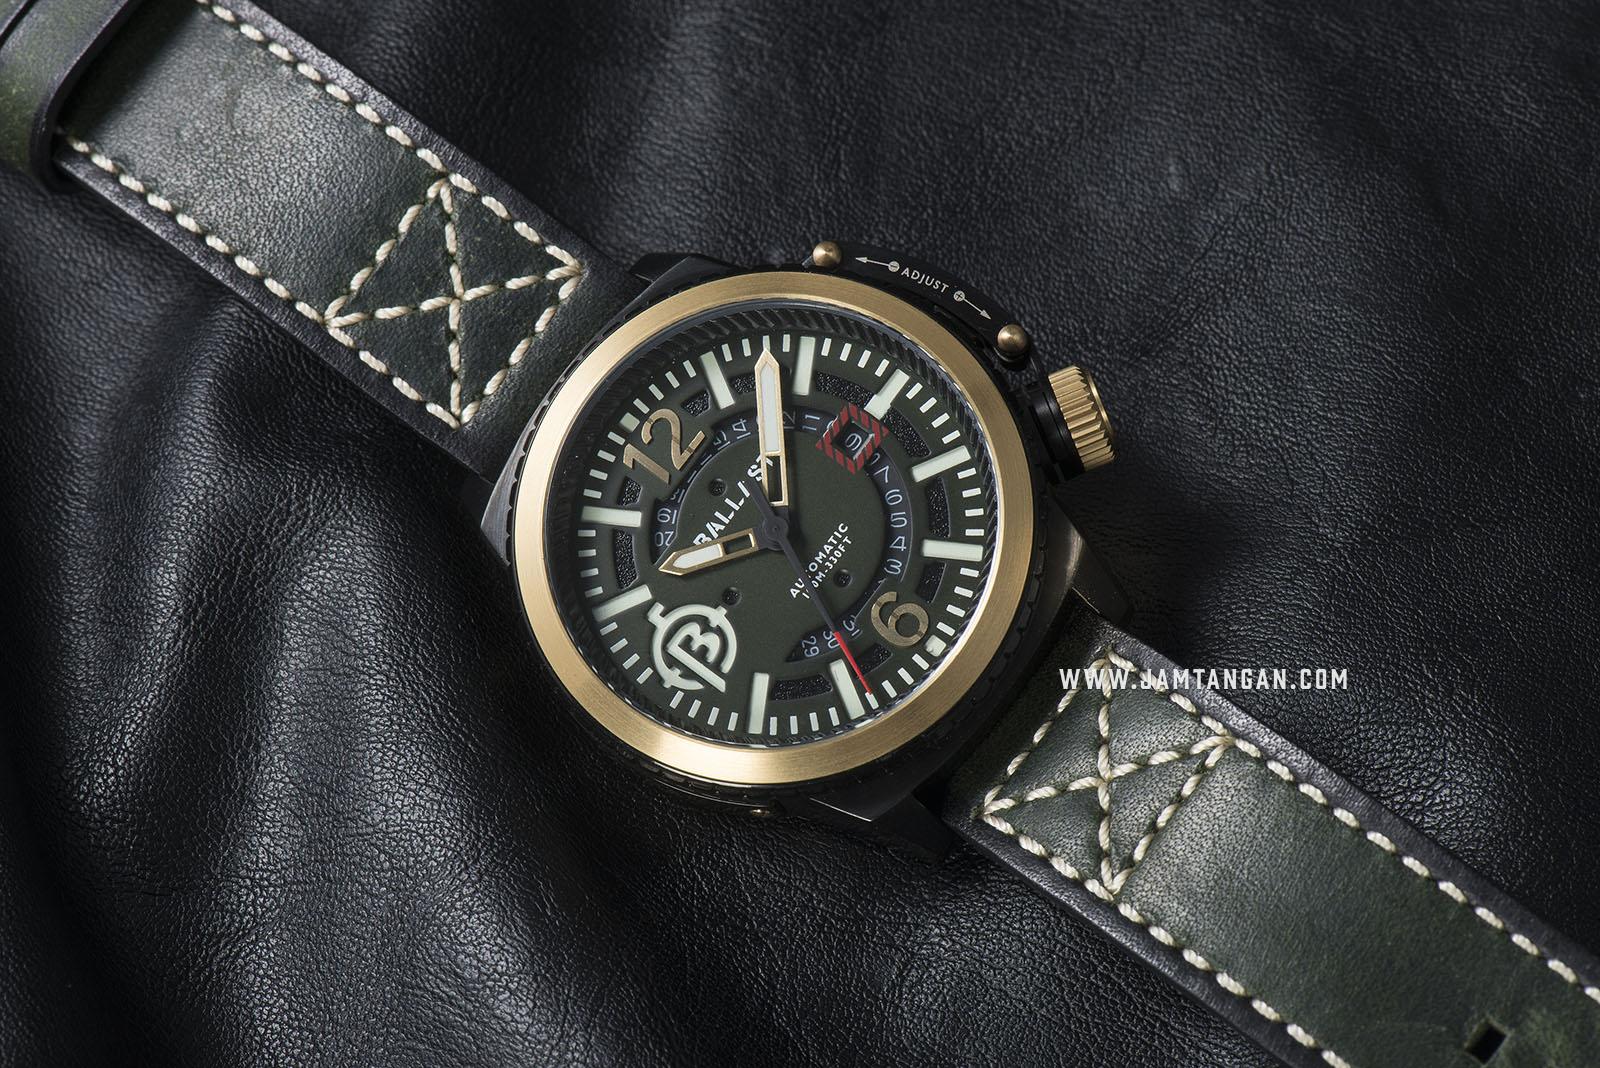 Ballast BL-3133-0A Trafalgar Automatic Green Dial Green Leather Strap Machtwatch